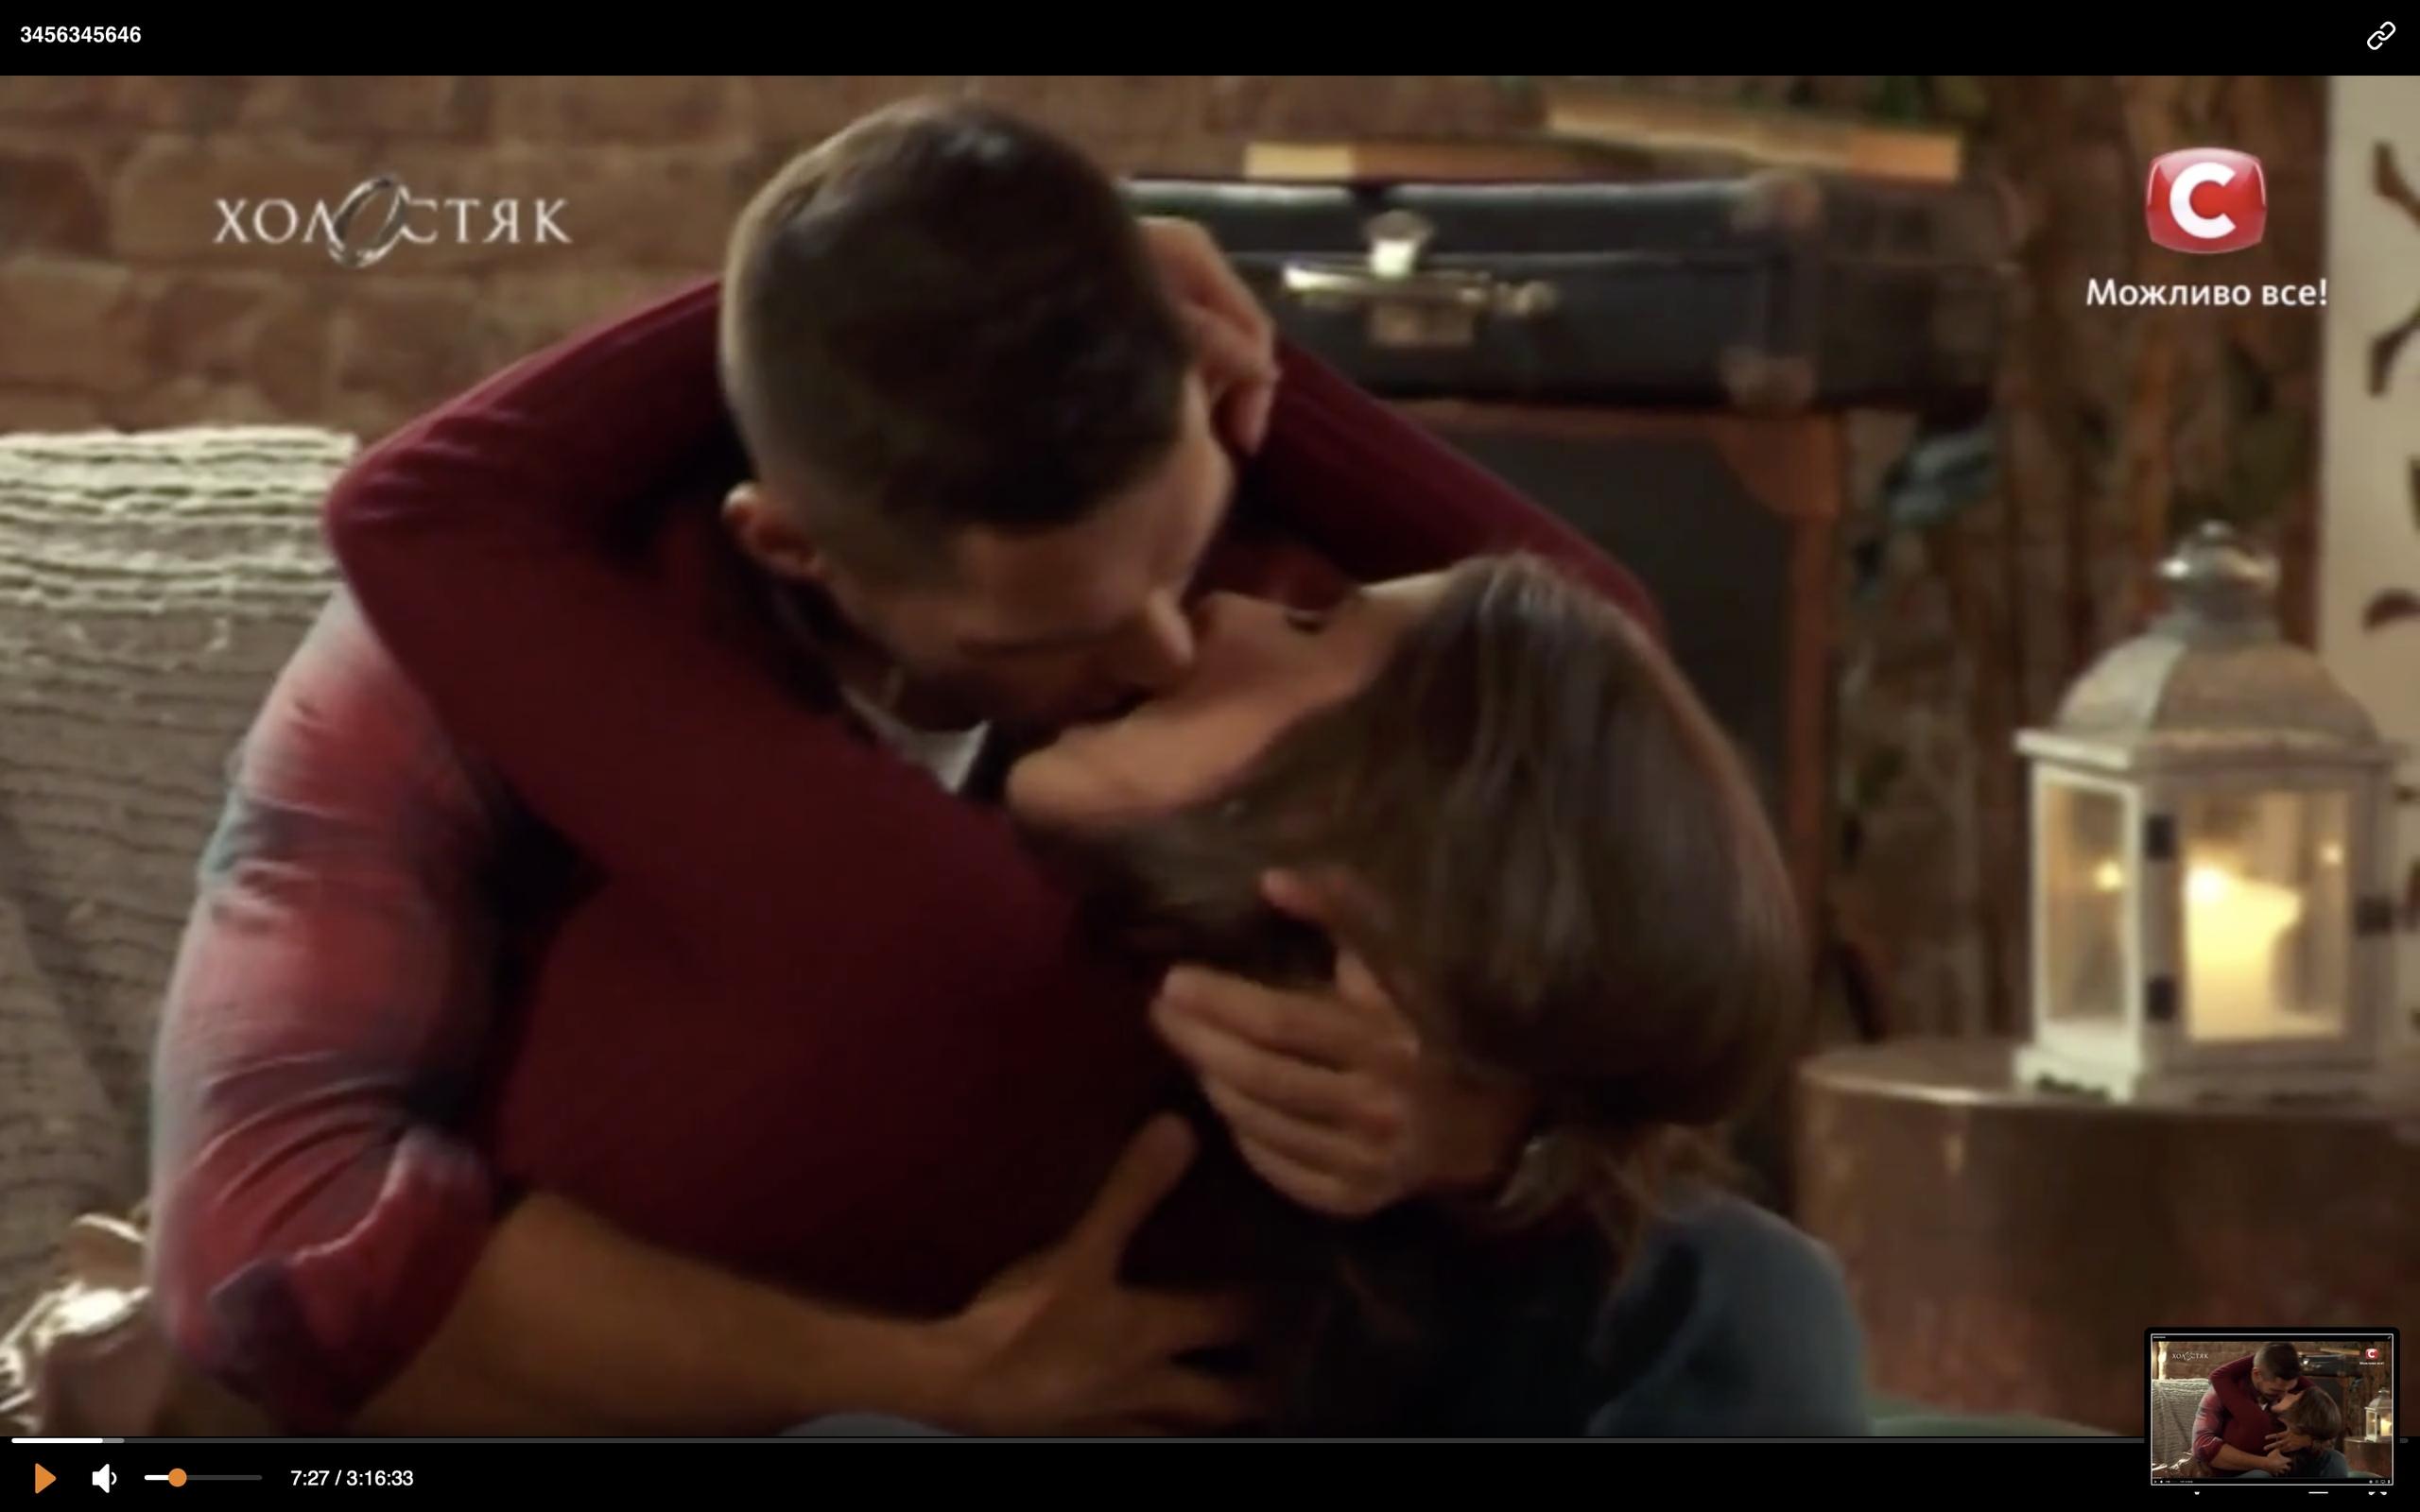 Bachelor Ukraine - Season 9 - Nikita Dobrynin - *Sleuthing Spoilers* - Page 10 2J-ehsrlCVc